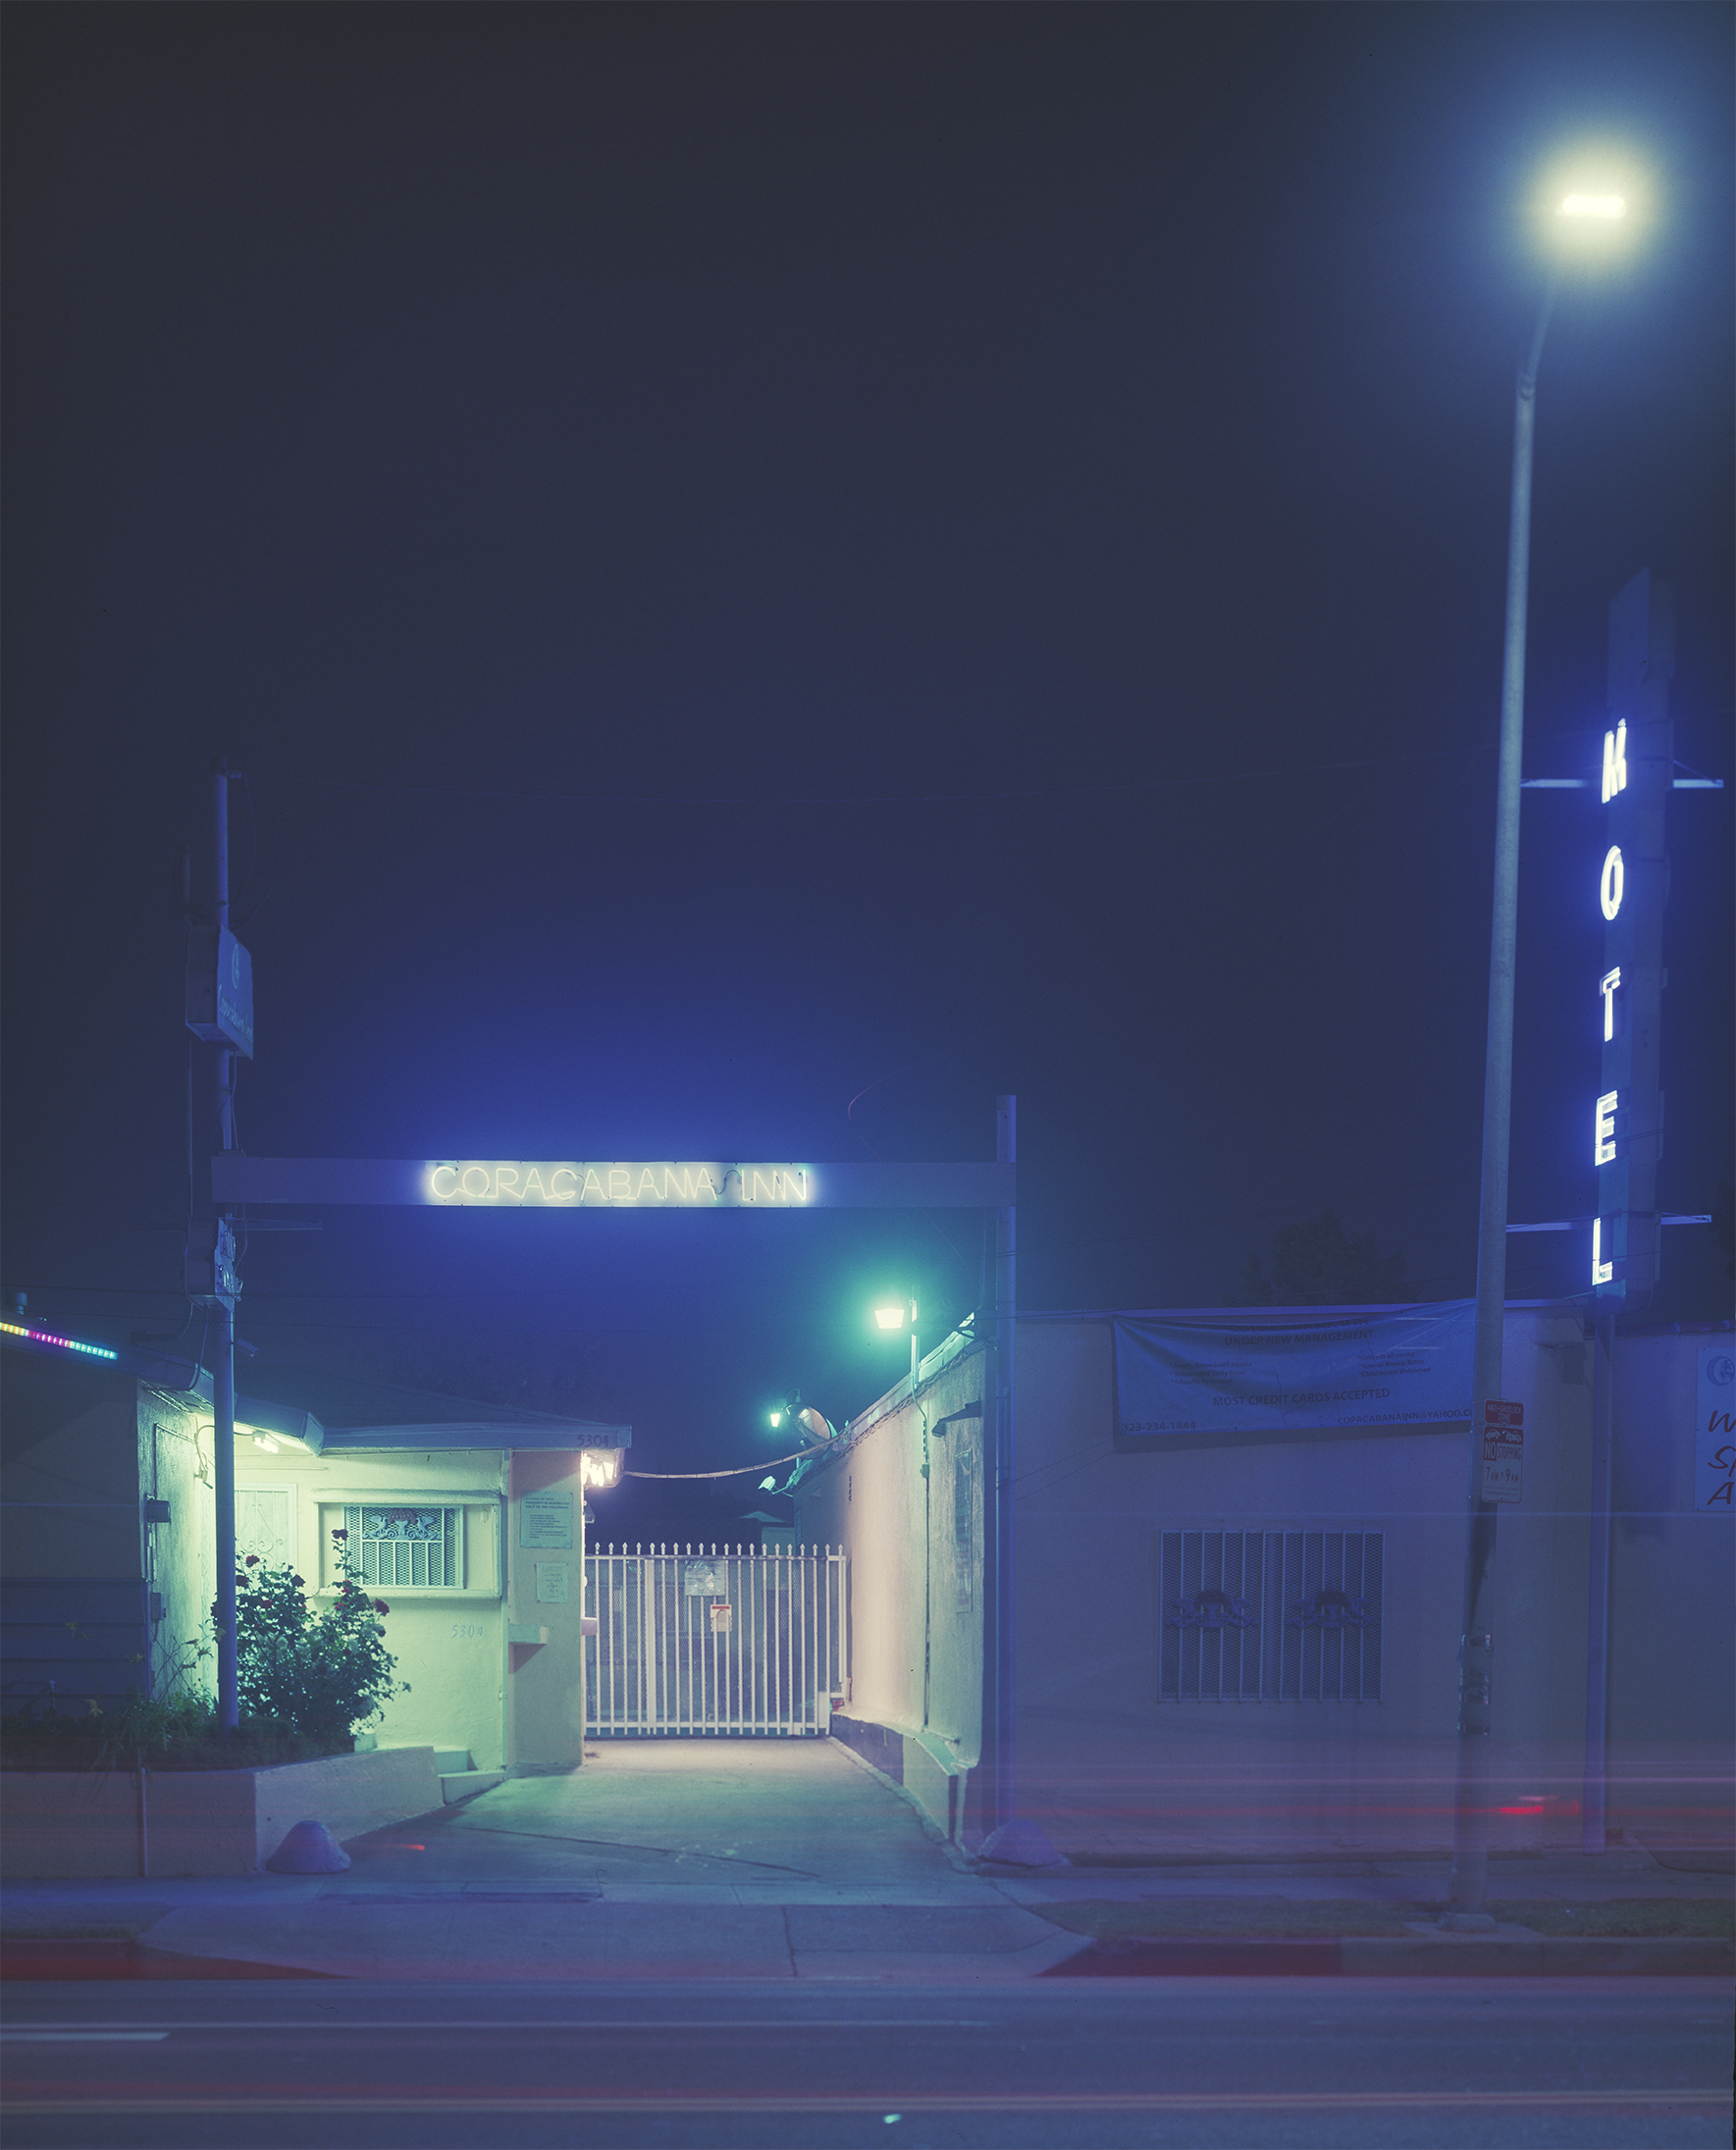 Vicky_Moon_16.jpg